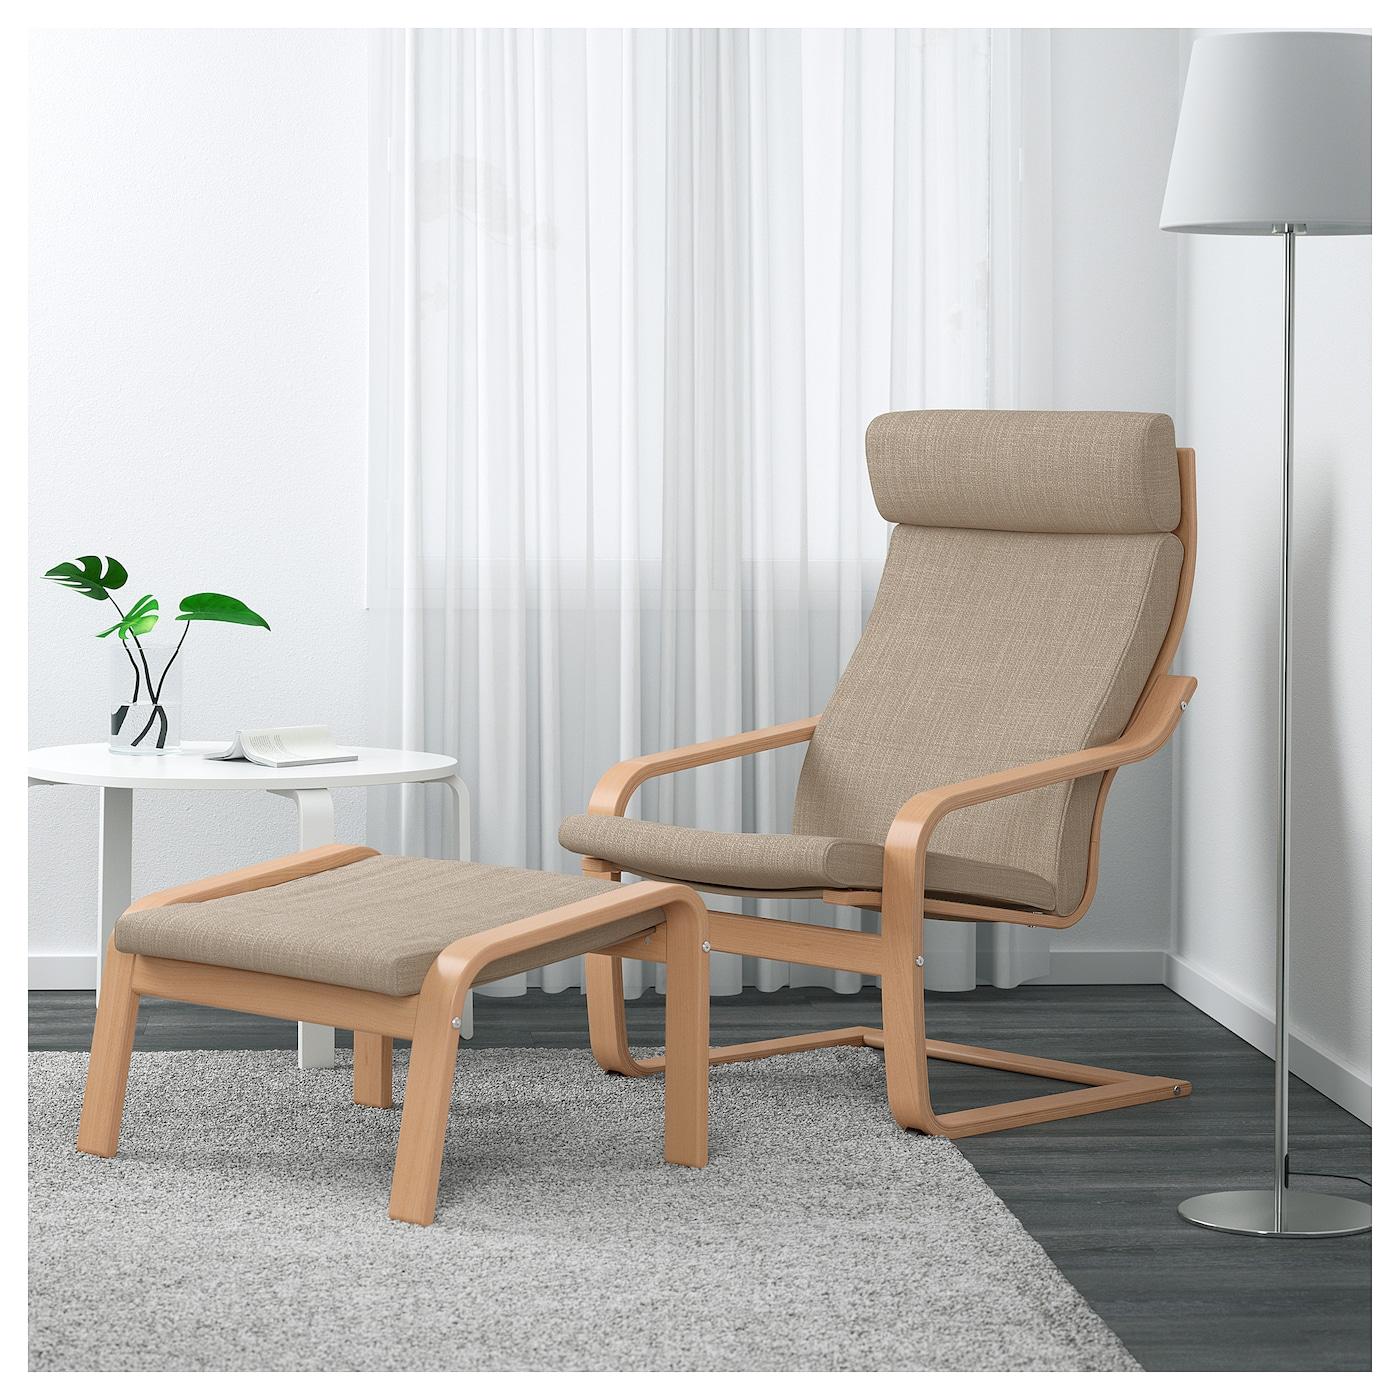 po ng repose pieds plaqu h tre hillared beige ikea. Black Bedroom Furniture Sets. Home Design Ideas